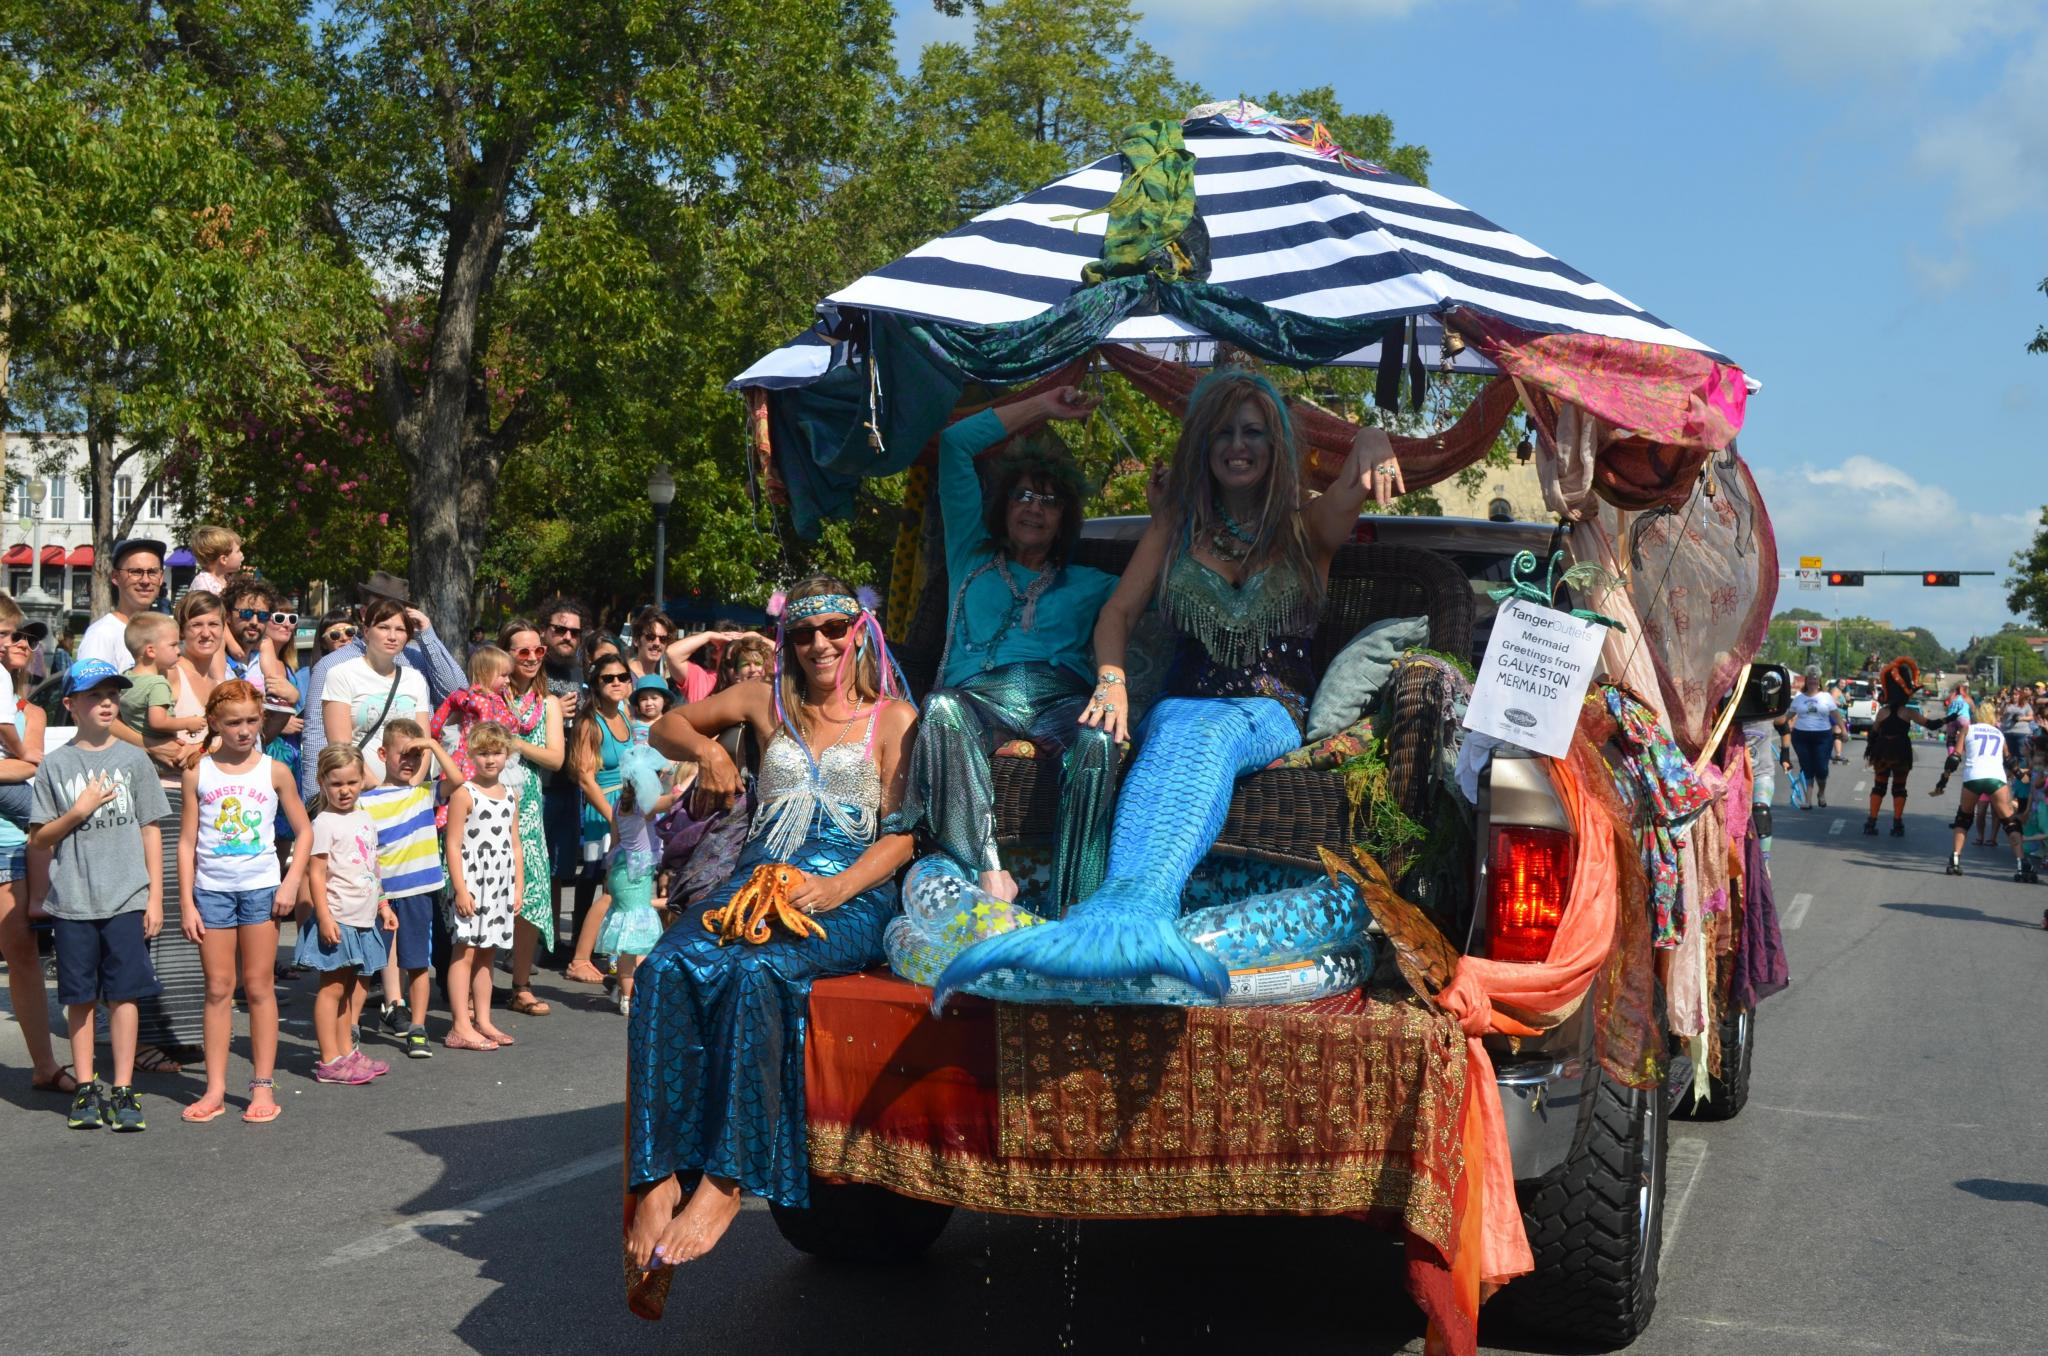 Mermaid Society SMTX's Mermaid Promenade and Downtown Street Faire set for Sept. 25